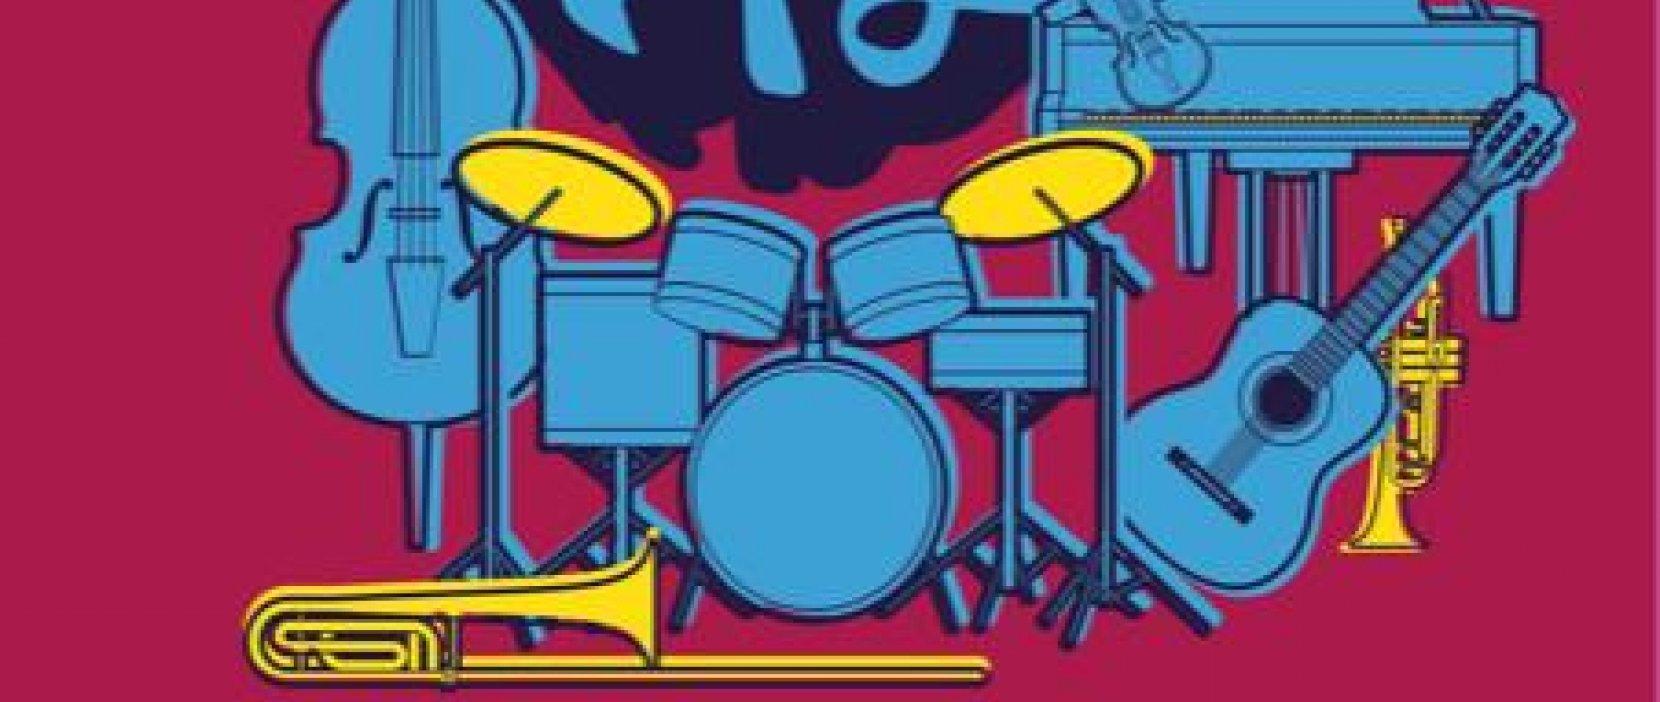 JazzCamp for Piger 2019